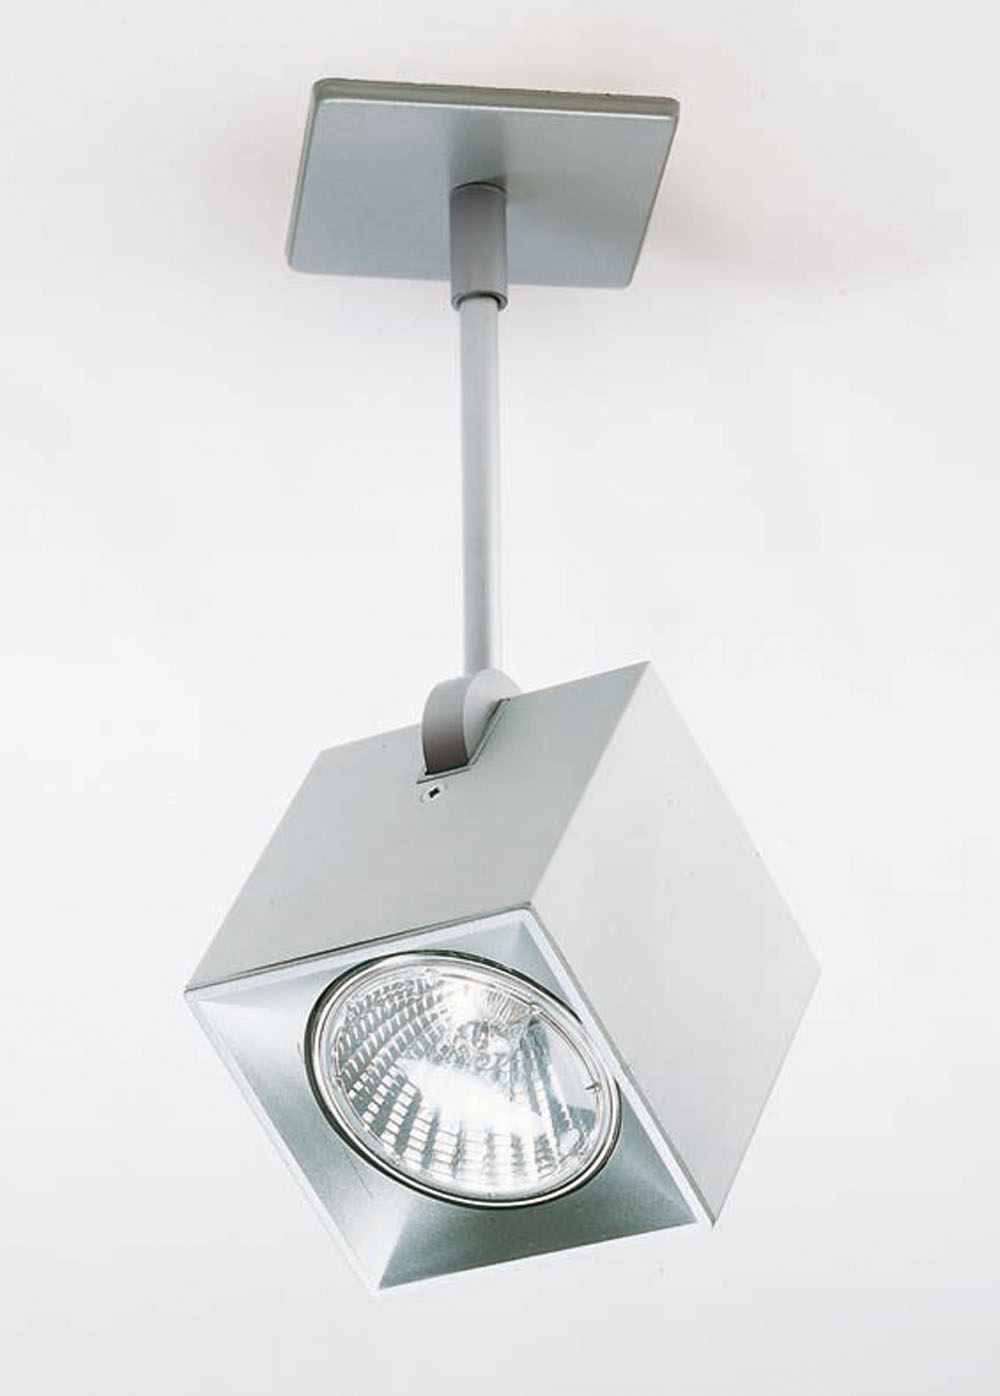 Milan iluminacion dau spot foco 1 luz con base de techo - Iluminacion lamparas de techo ...